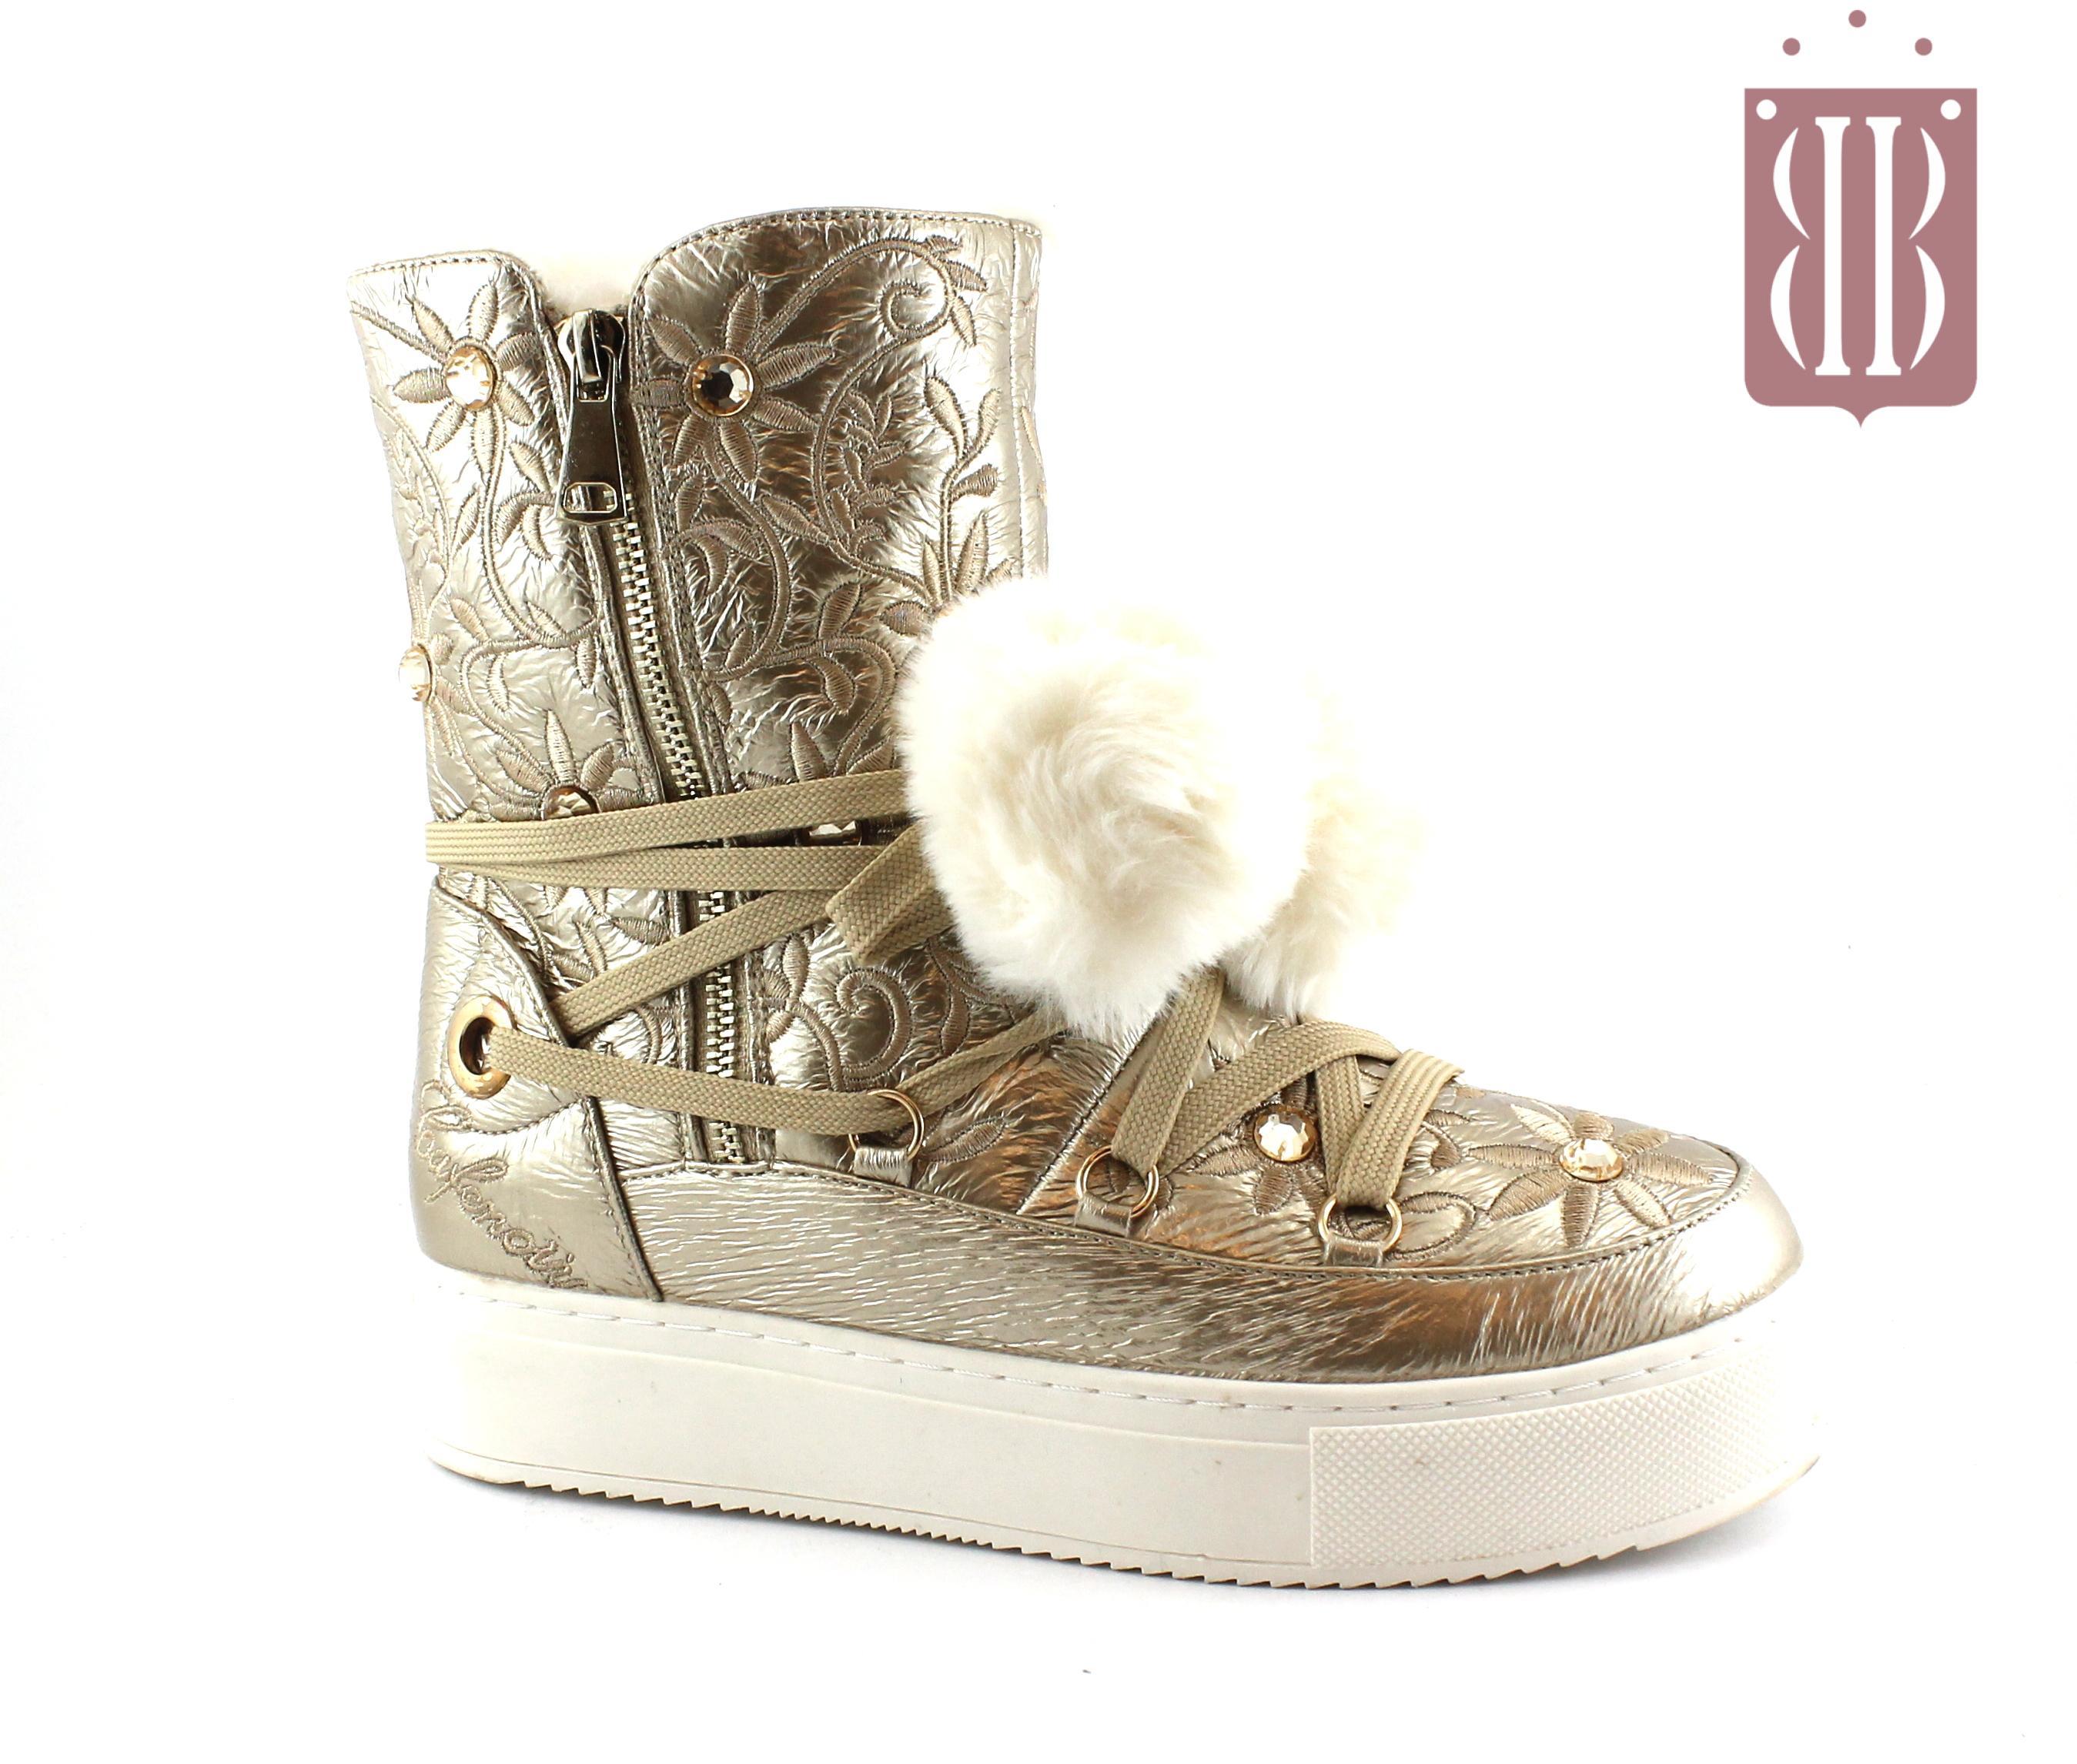 CAFè NOIR FB921 platino oro scarpe donna scarponcini zip pom pon